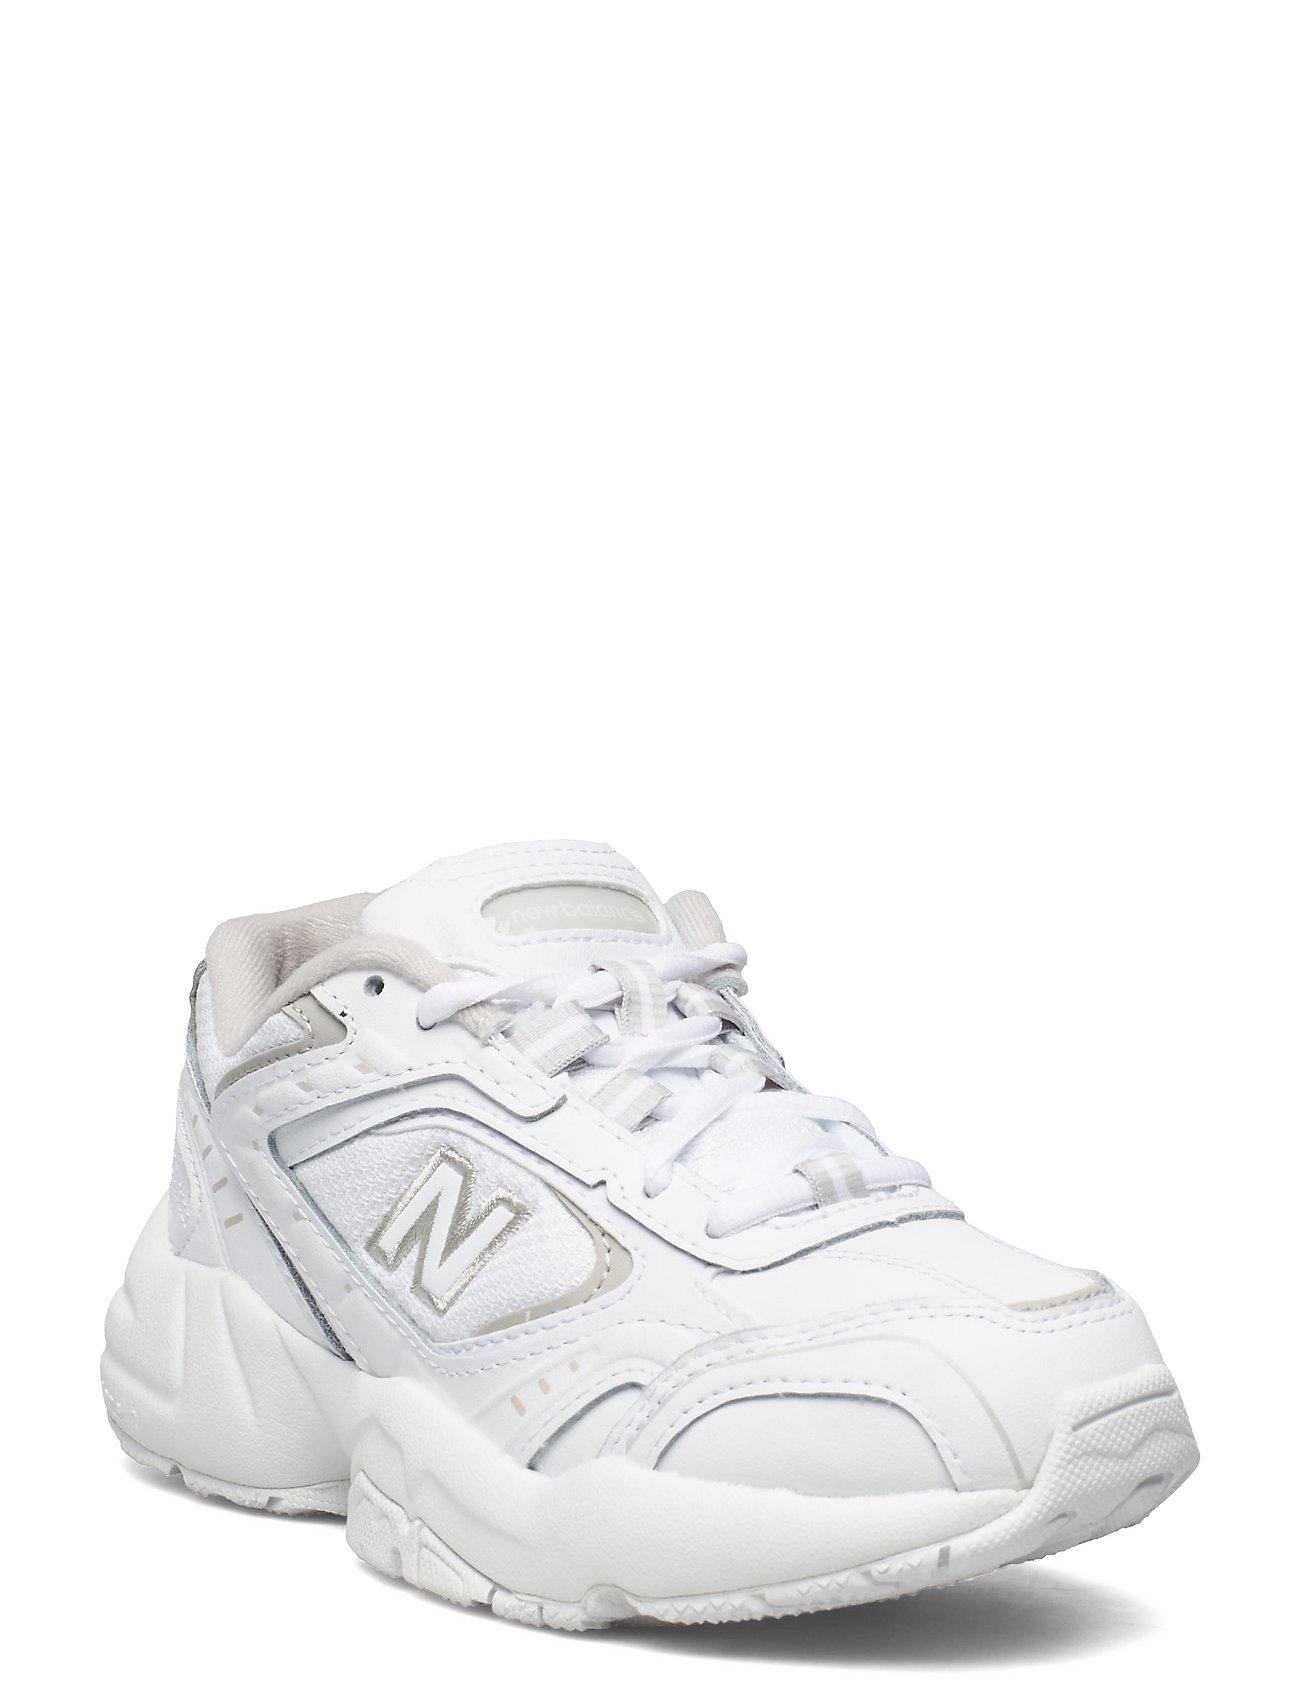 New Balance - WX452SG - white/grey - 0